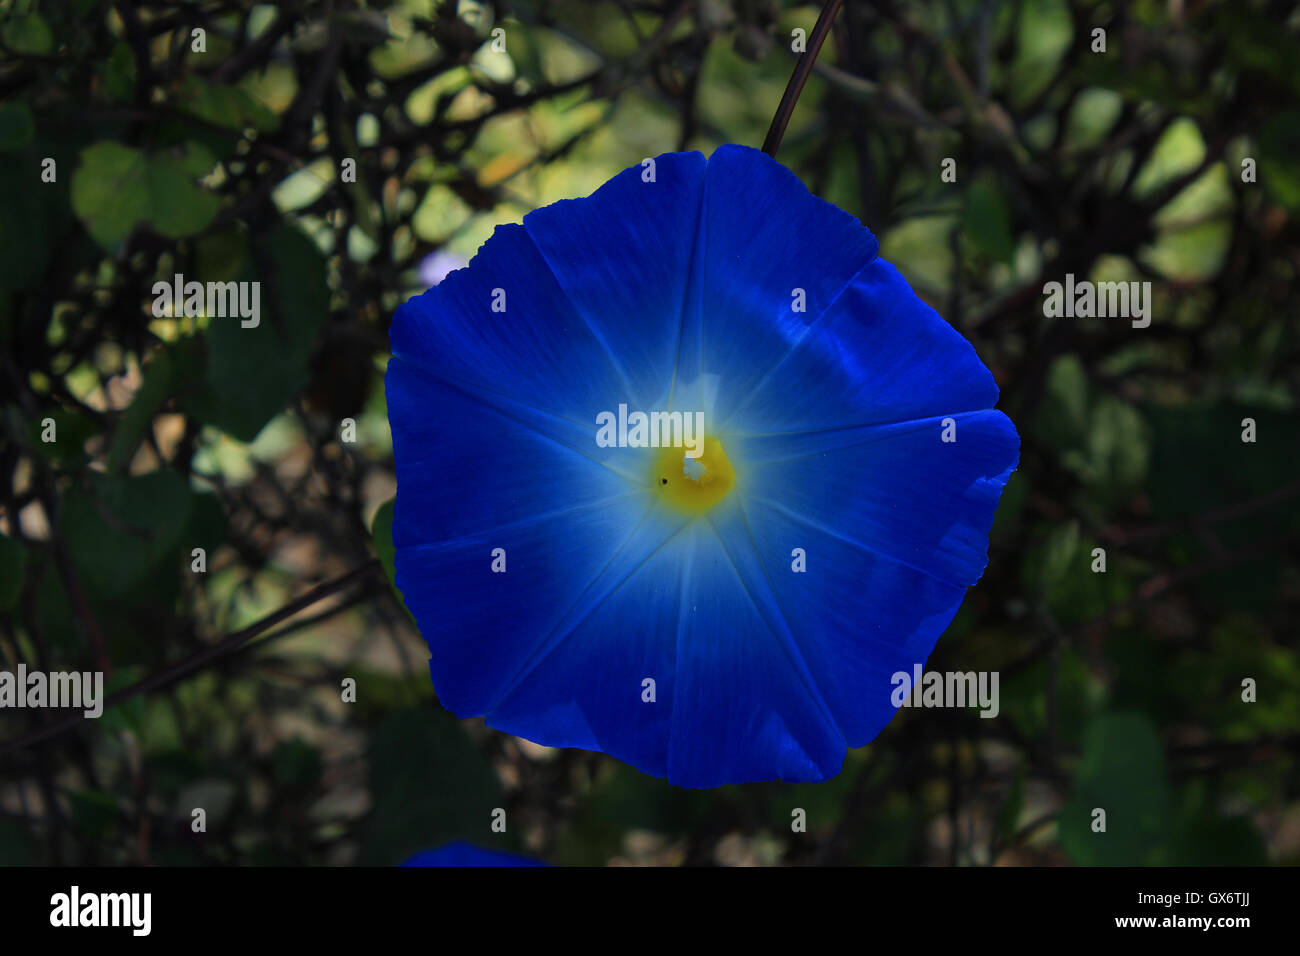 A colorful blue flower with a yellow center blooming on the branch a colorful blue flower with a yellow center blooming on the branch of a bush in a garden in cotacachi ecuador mightylinksfo